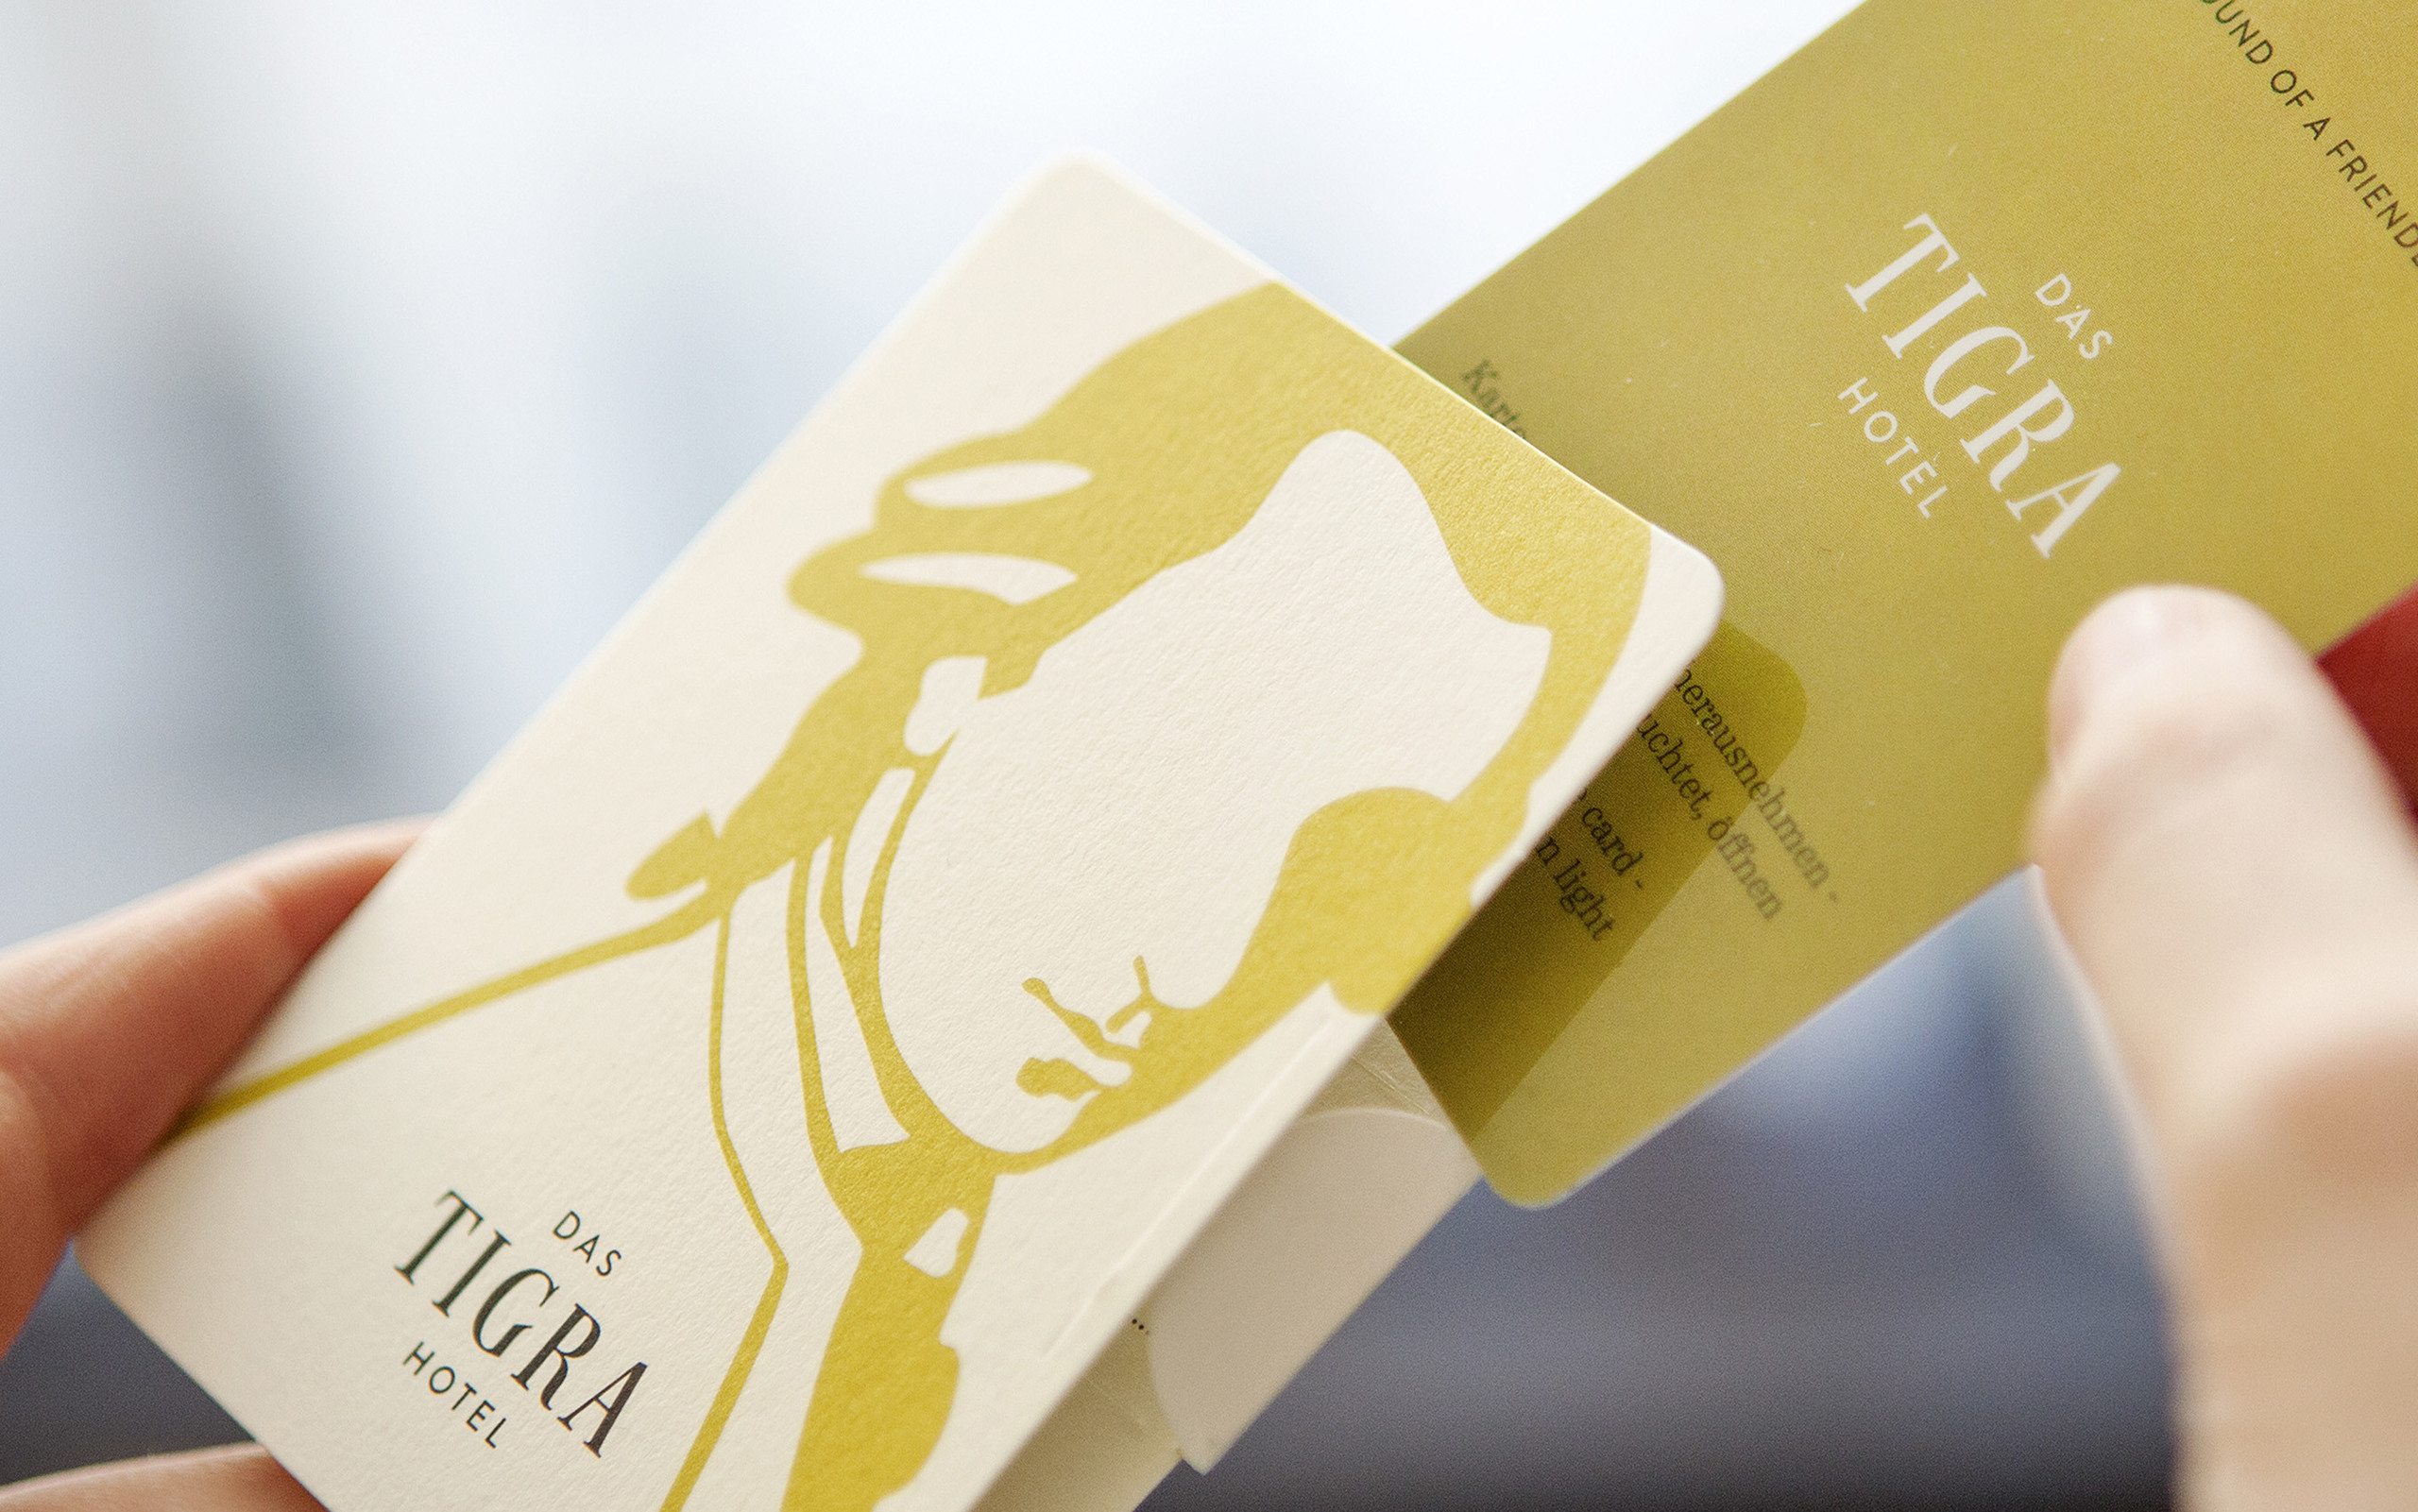 Hotel Das Tigra Branding